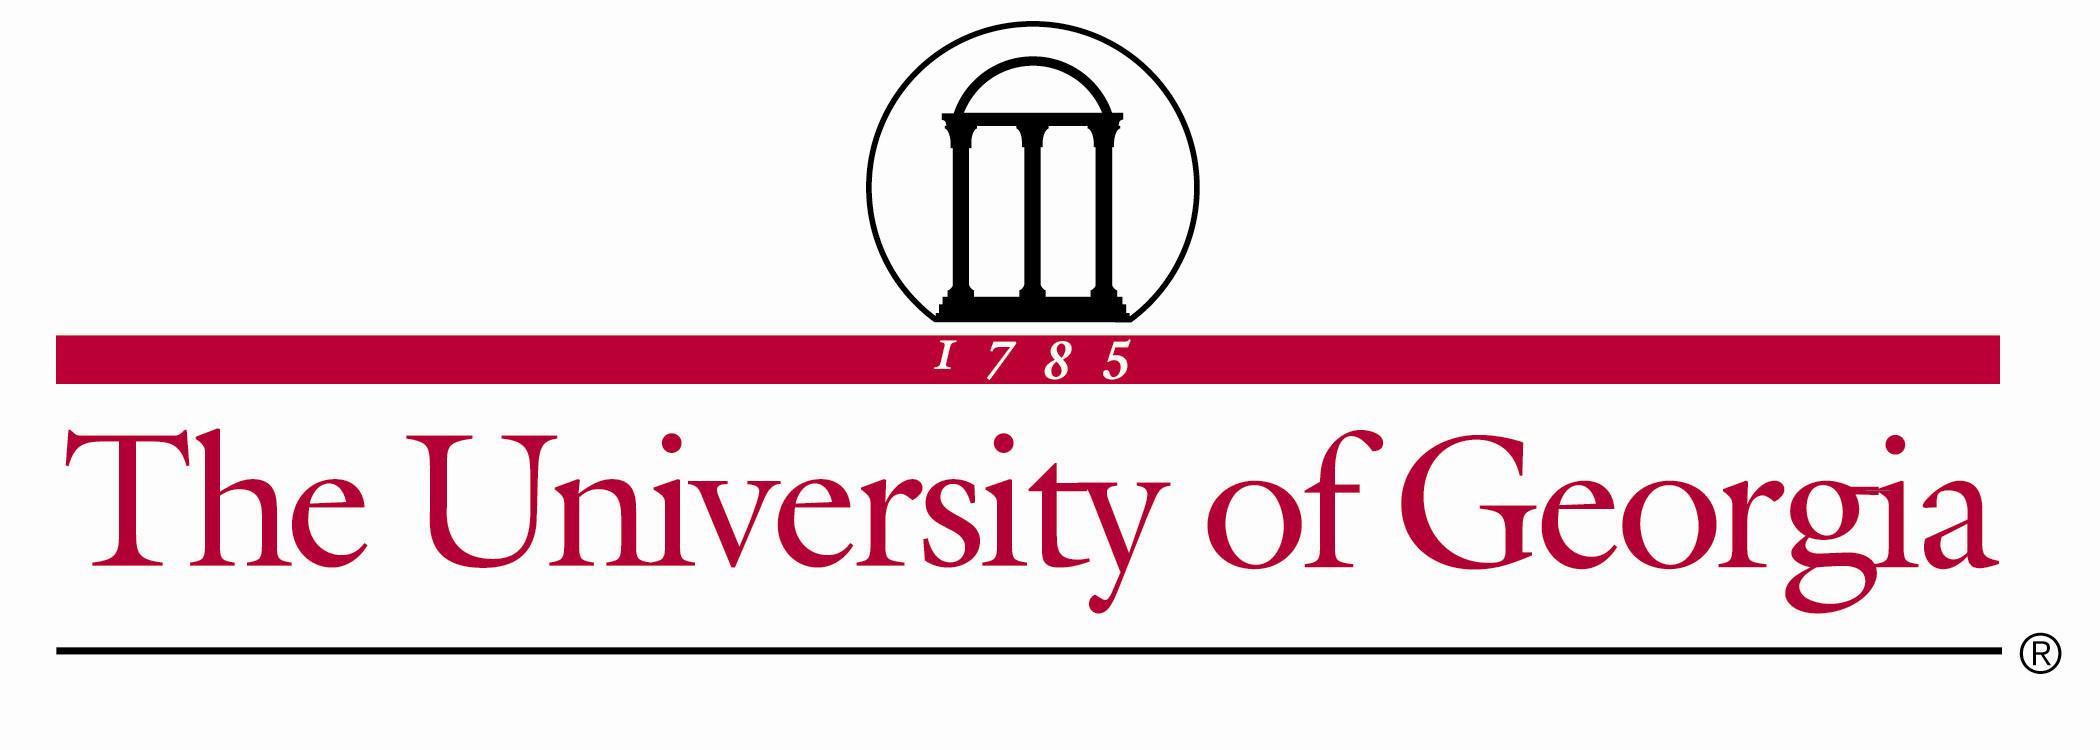 Логотип Университета Джорджии